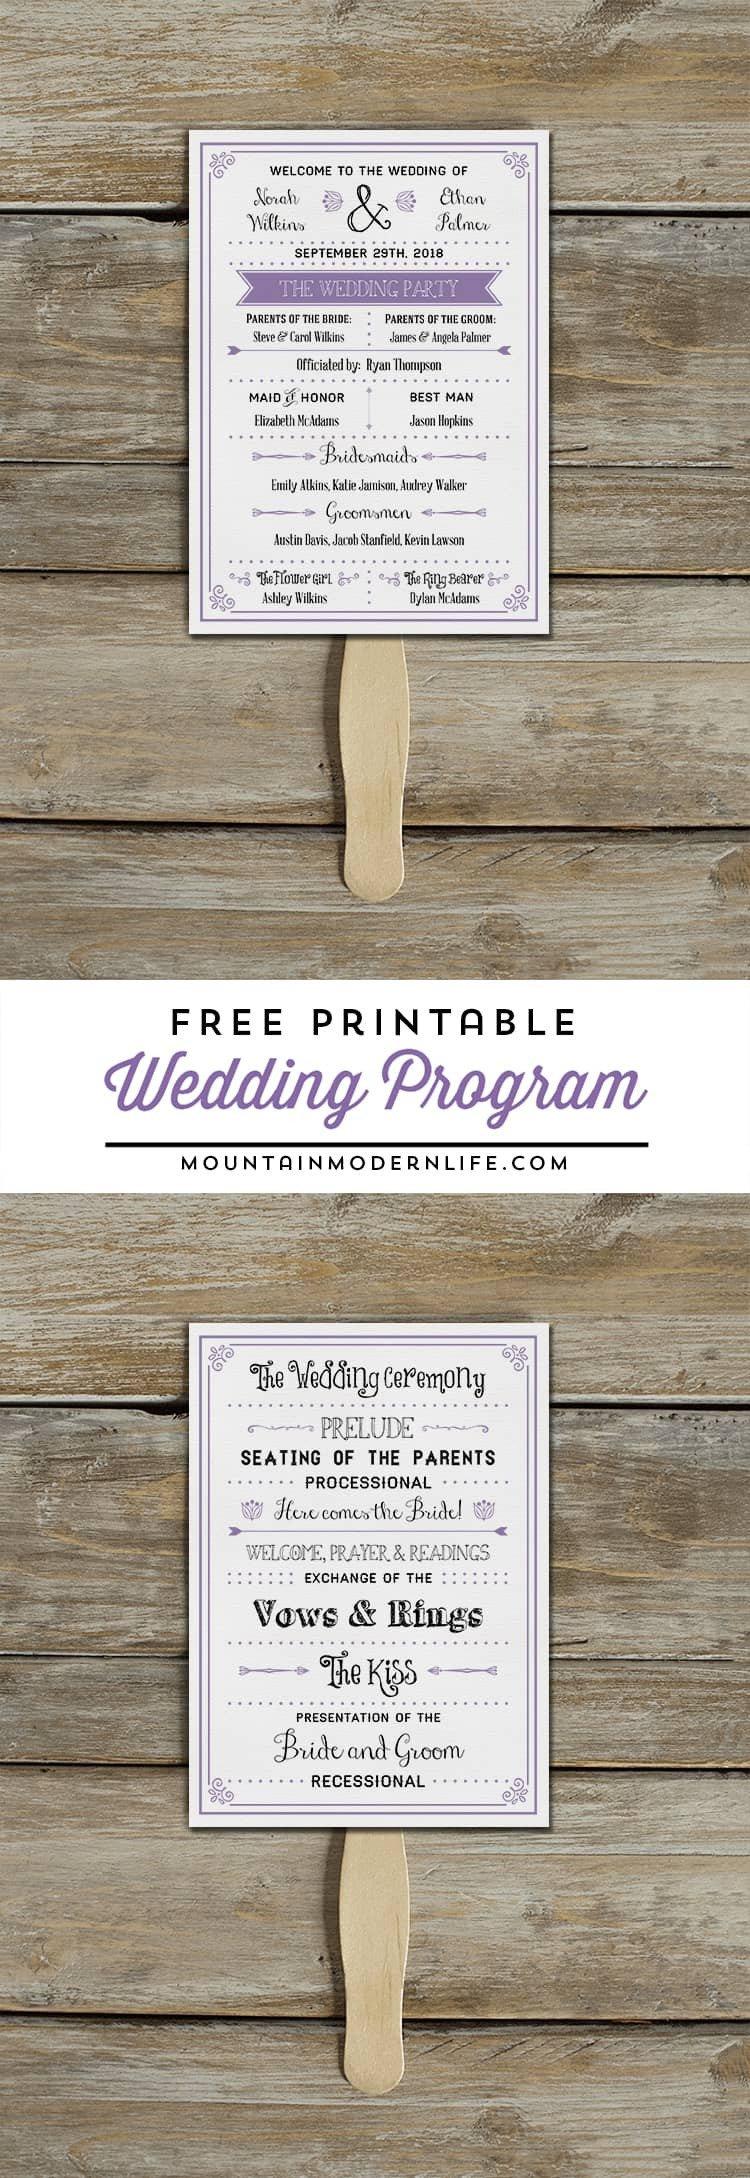 Wedding Programs Free Templates Free Printable Wedding Program